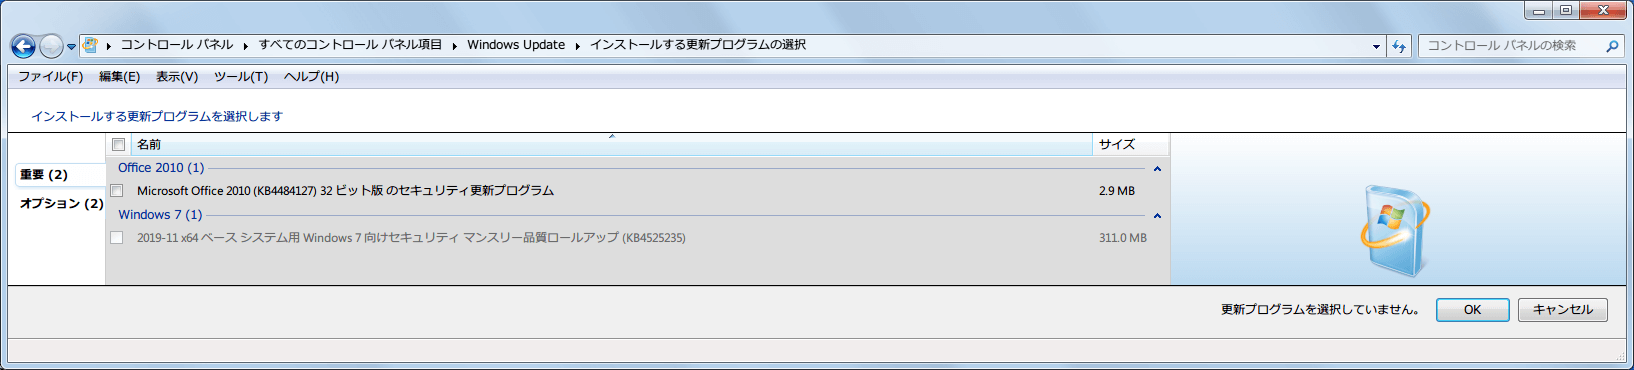 Windows 7 64bit Windows Update 重要 2019年11月分リスト KB4525235 非表示